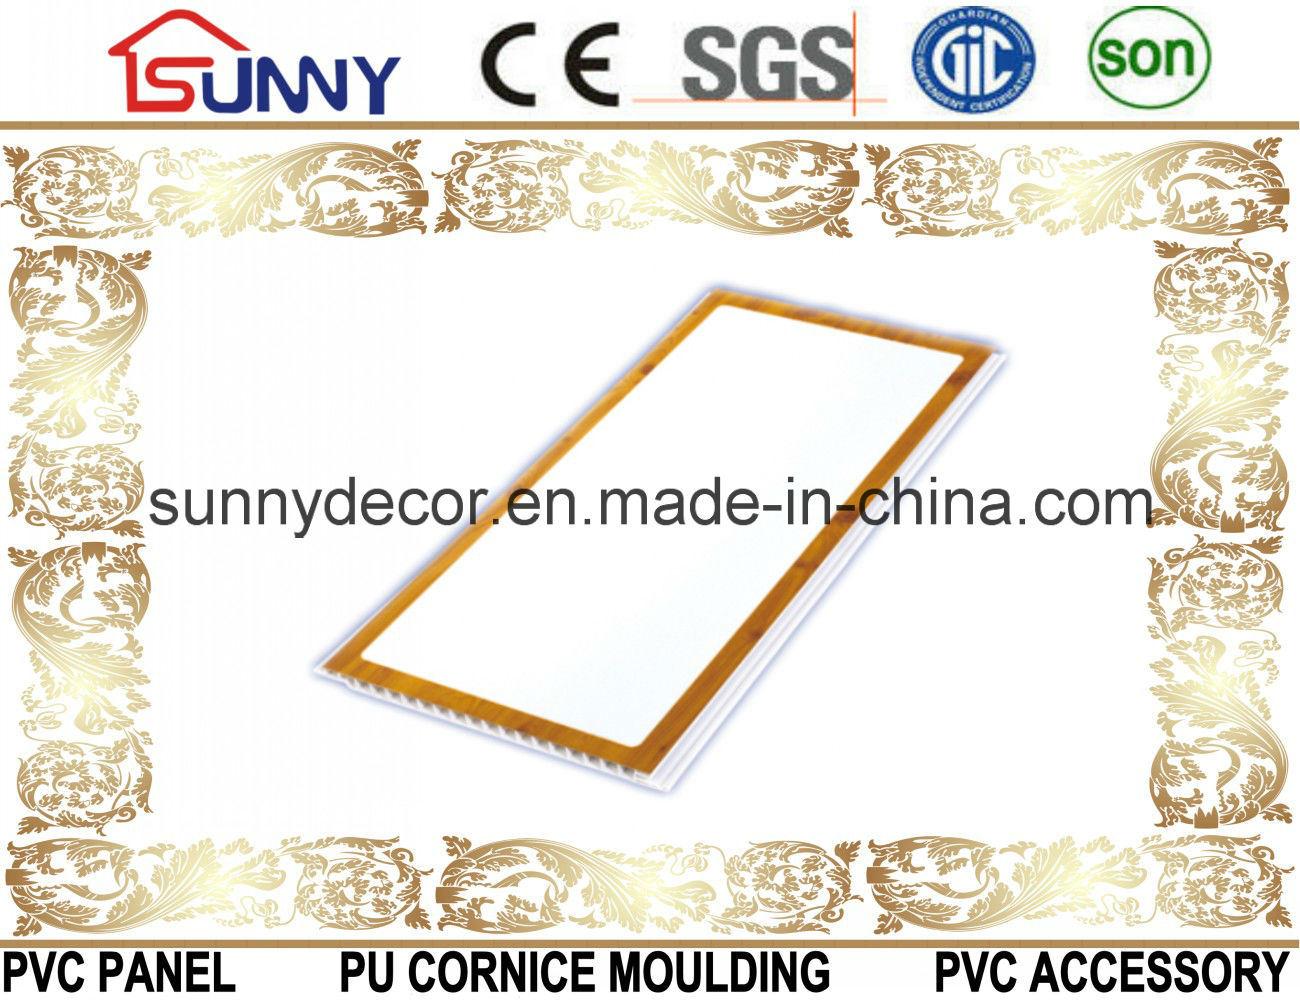 Hot Stamping PVC Panel PVC Ceiling PVC Wall Panel